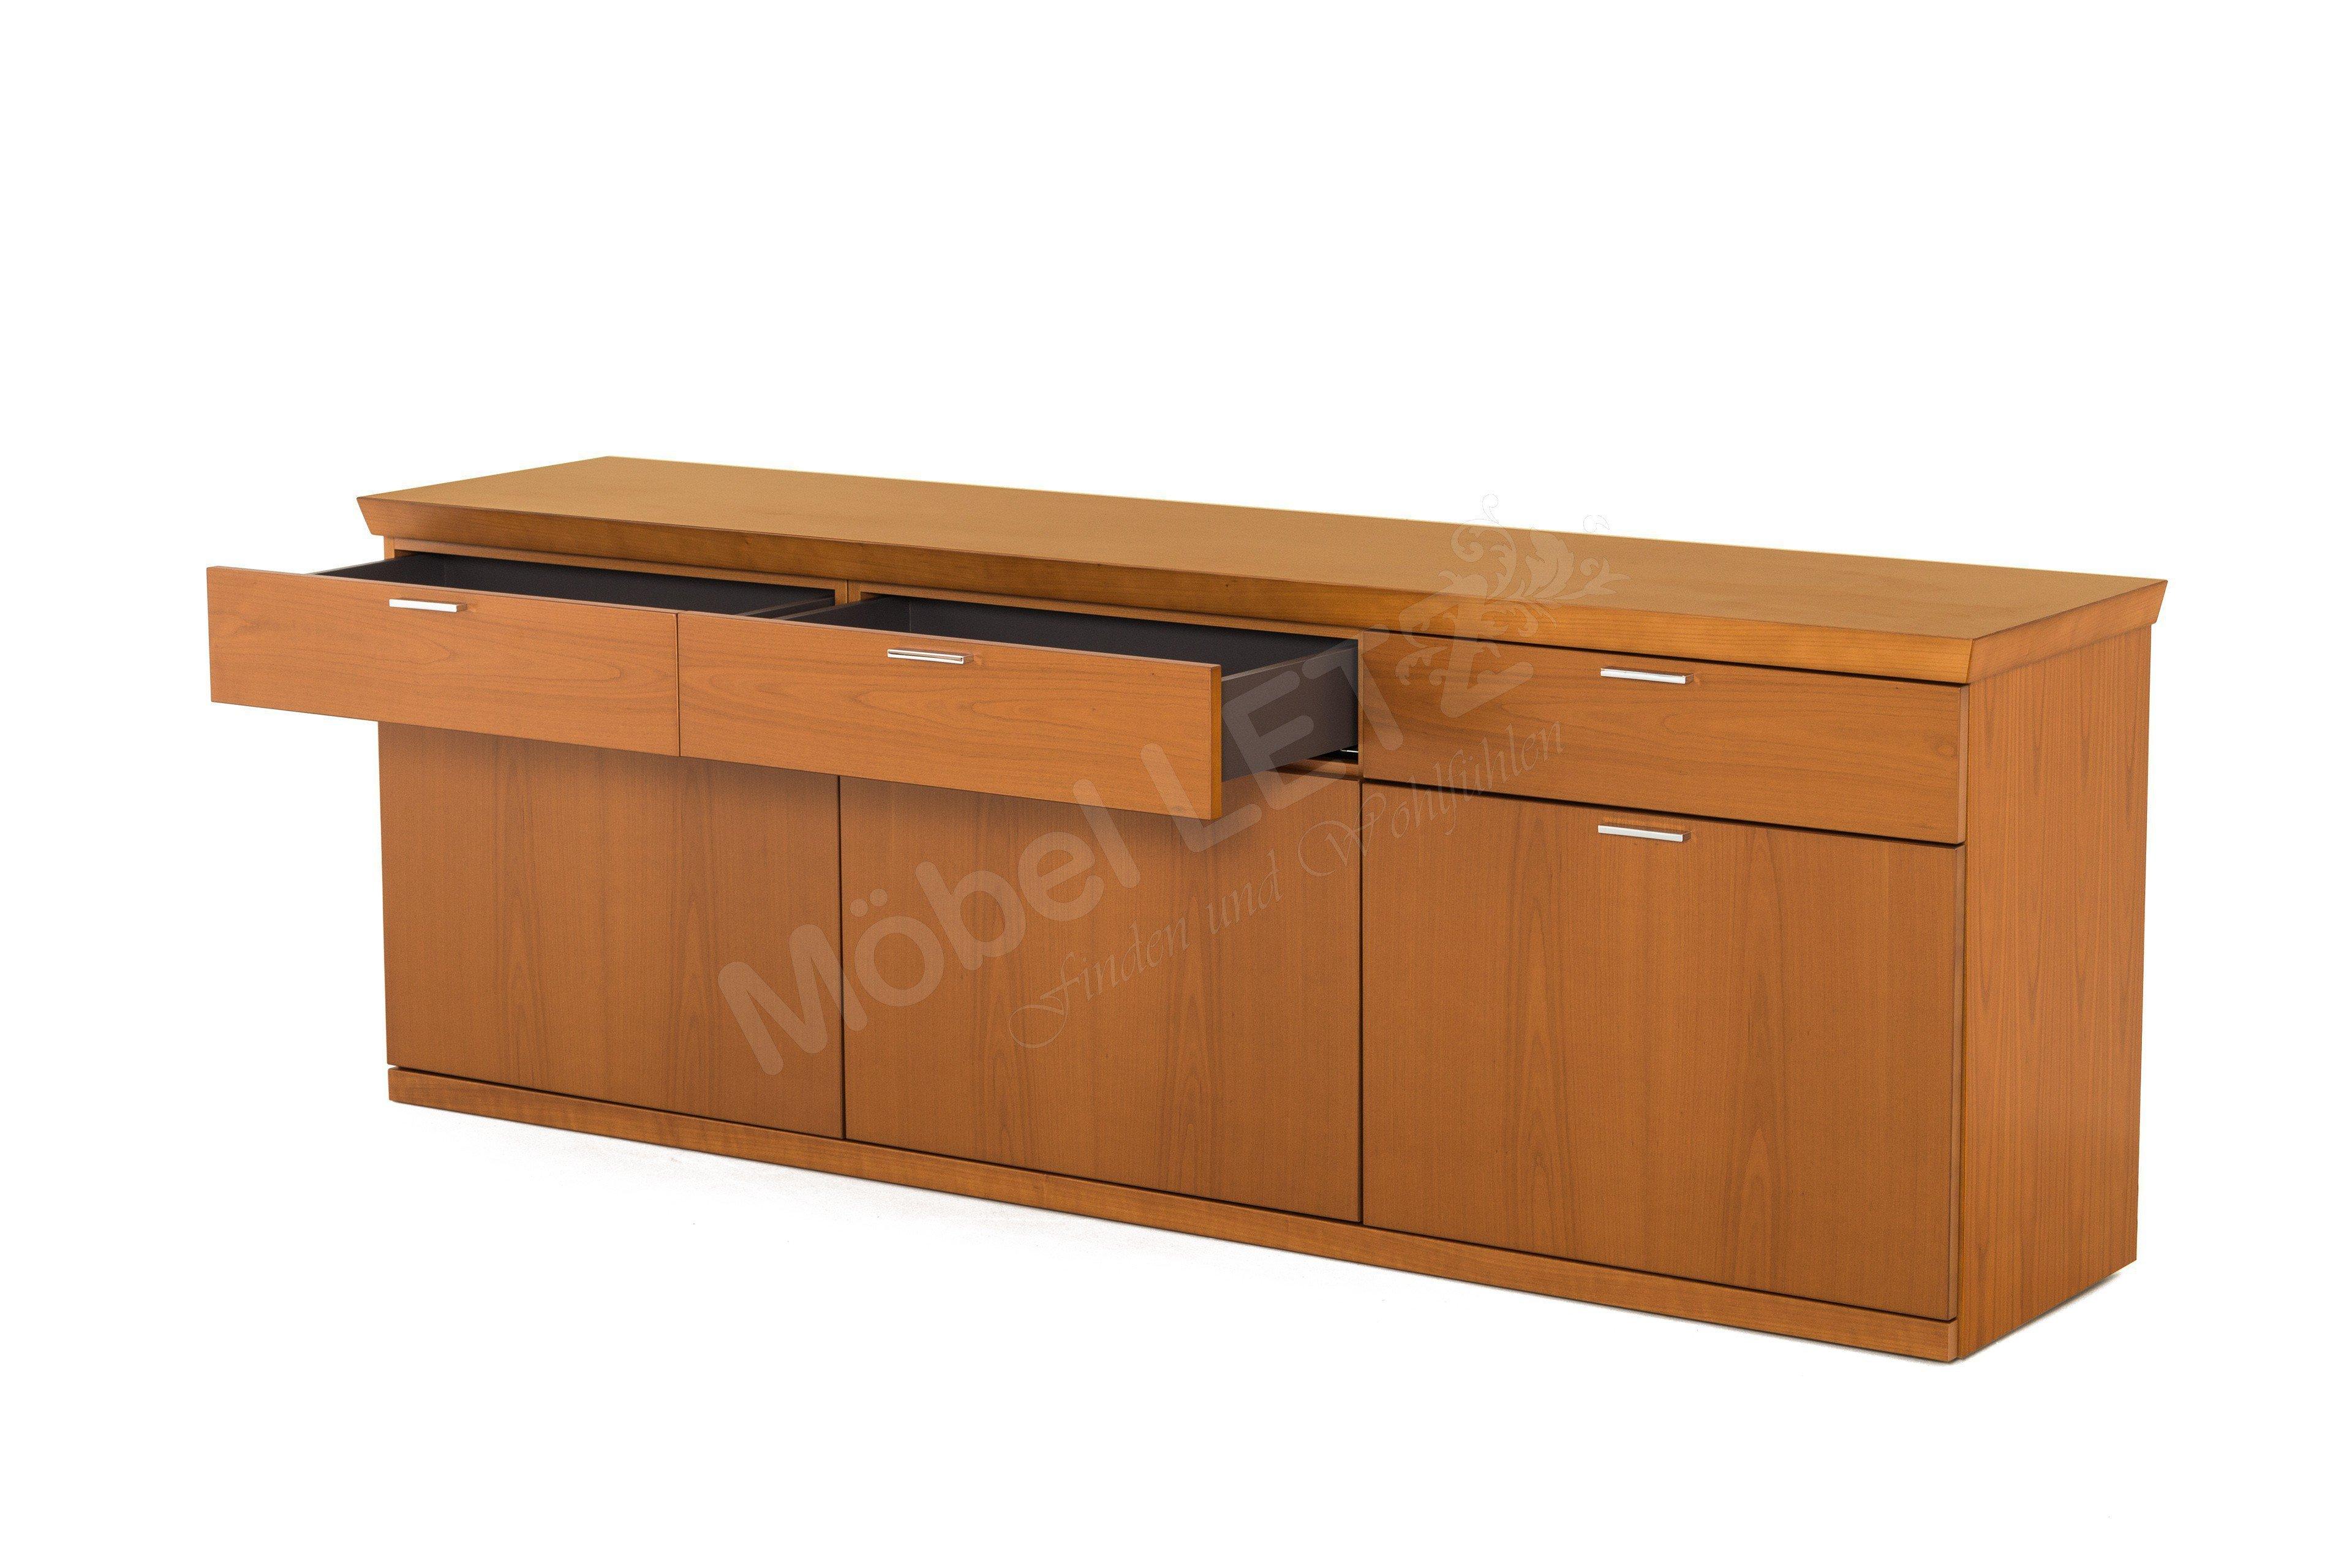 Rietberger m belwerke sideboard kirschbaum furniert for Sideboard kirschbaum